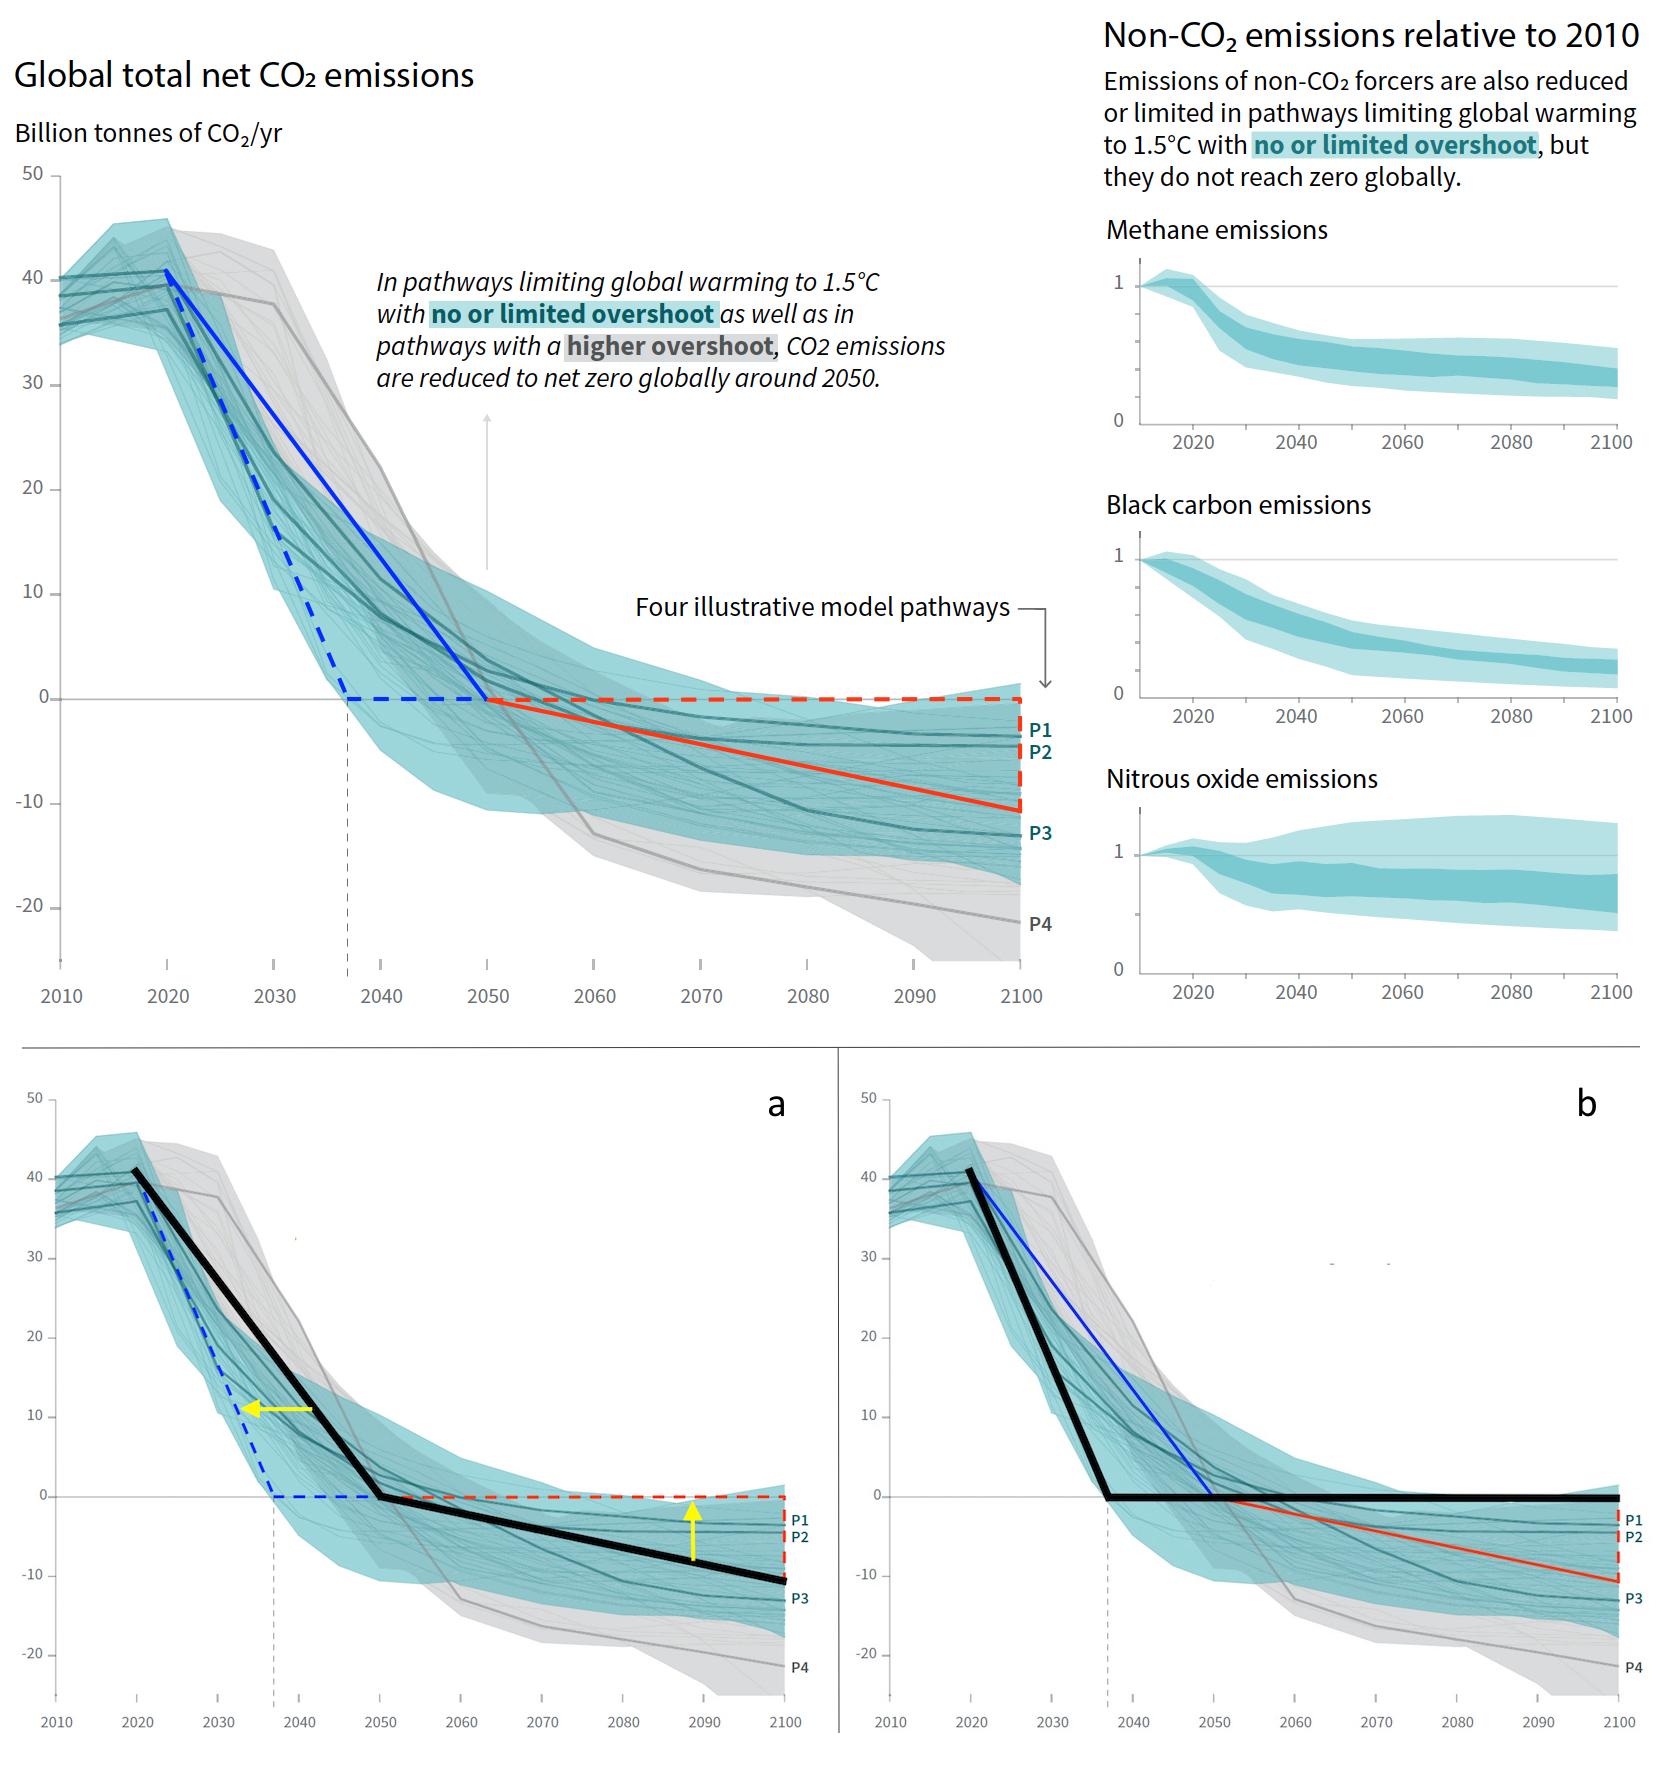 Emissionspfade des IPCC SR15 SPM, modifiziert mit Szenario ohne netto negative Emissionen.